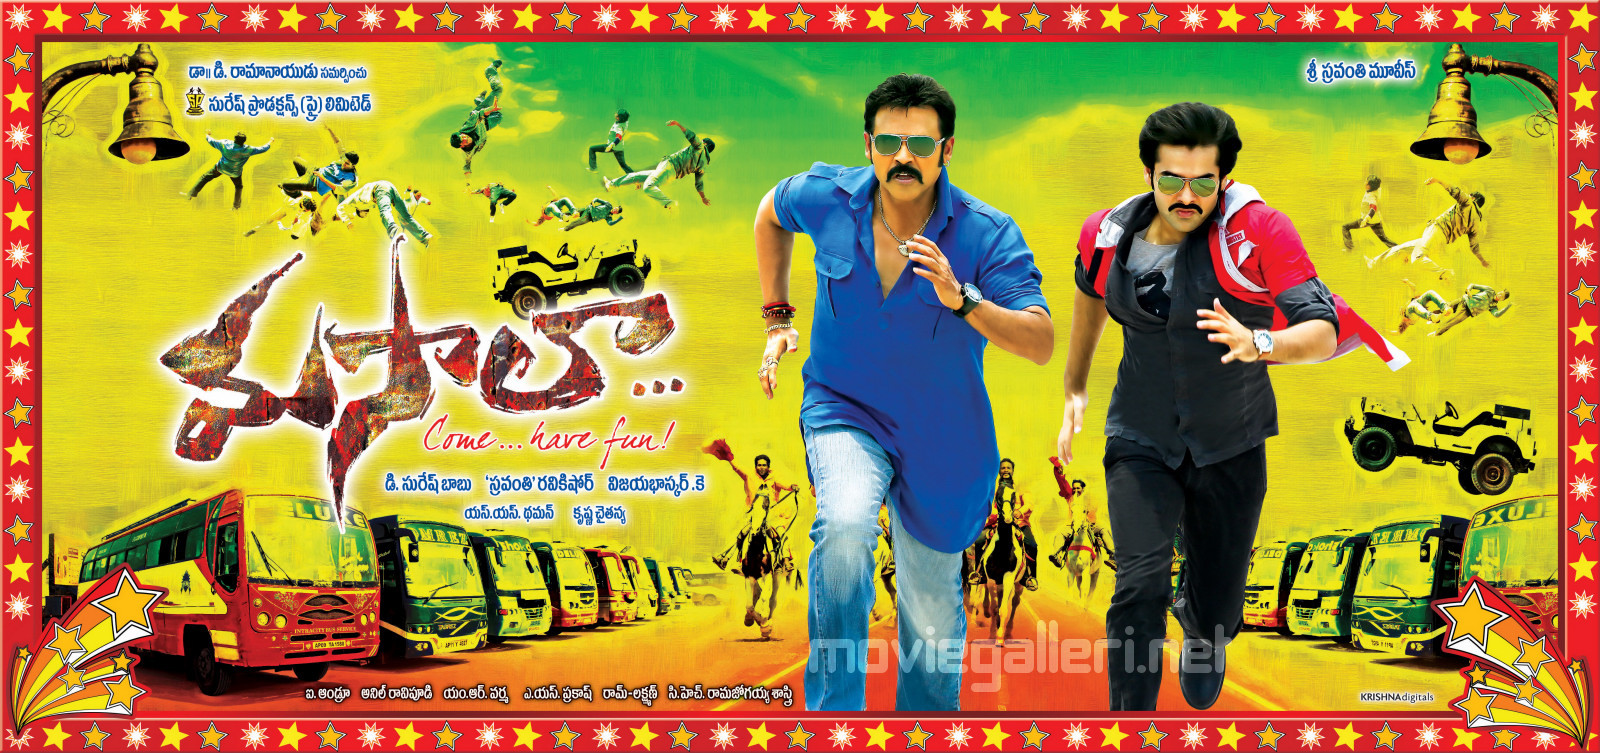 Venkatesh & Ram in Masala Movie First Look Wallpapers